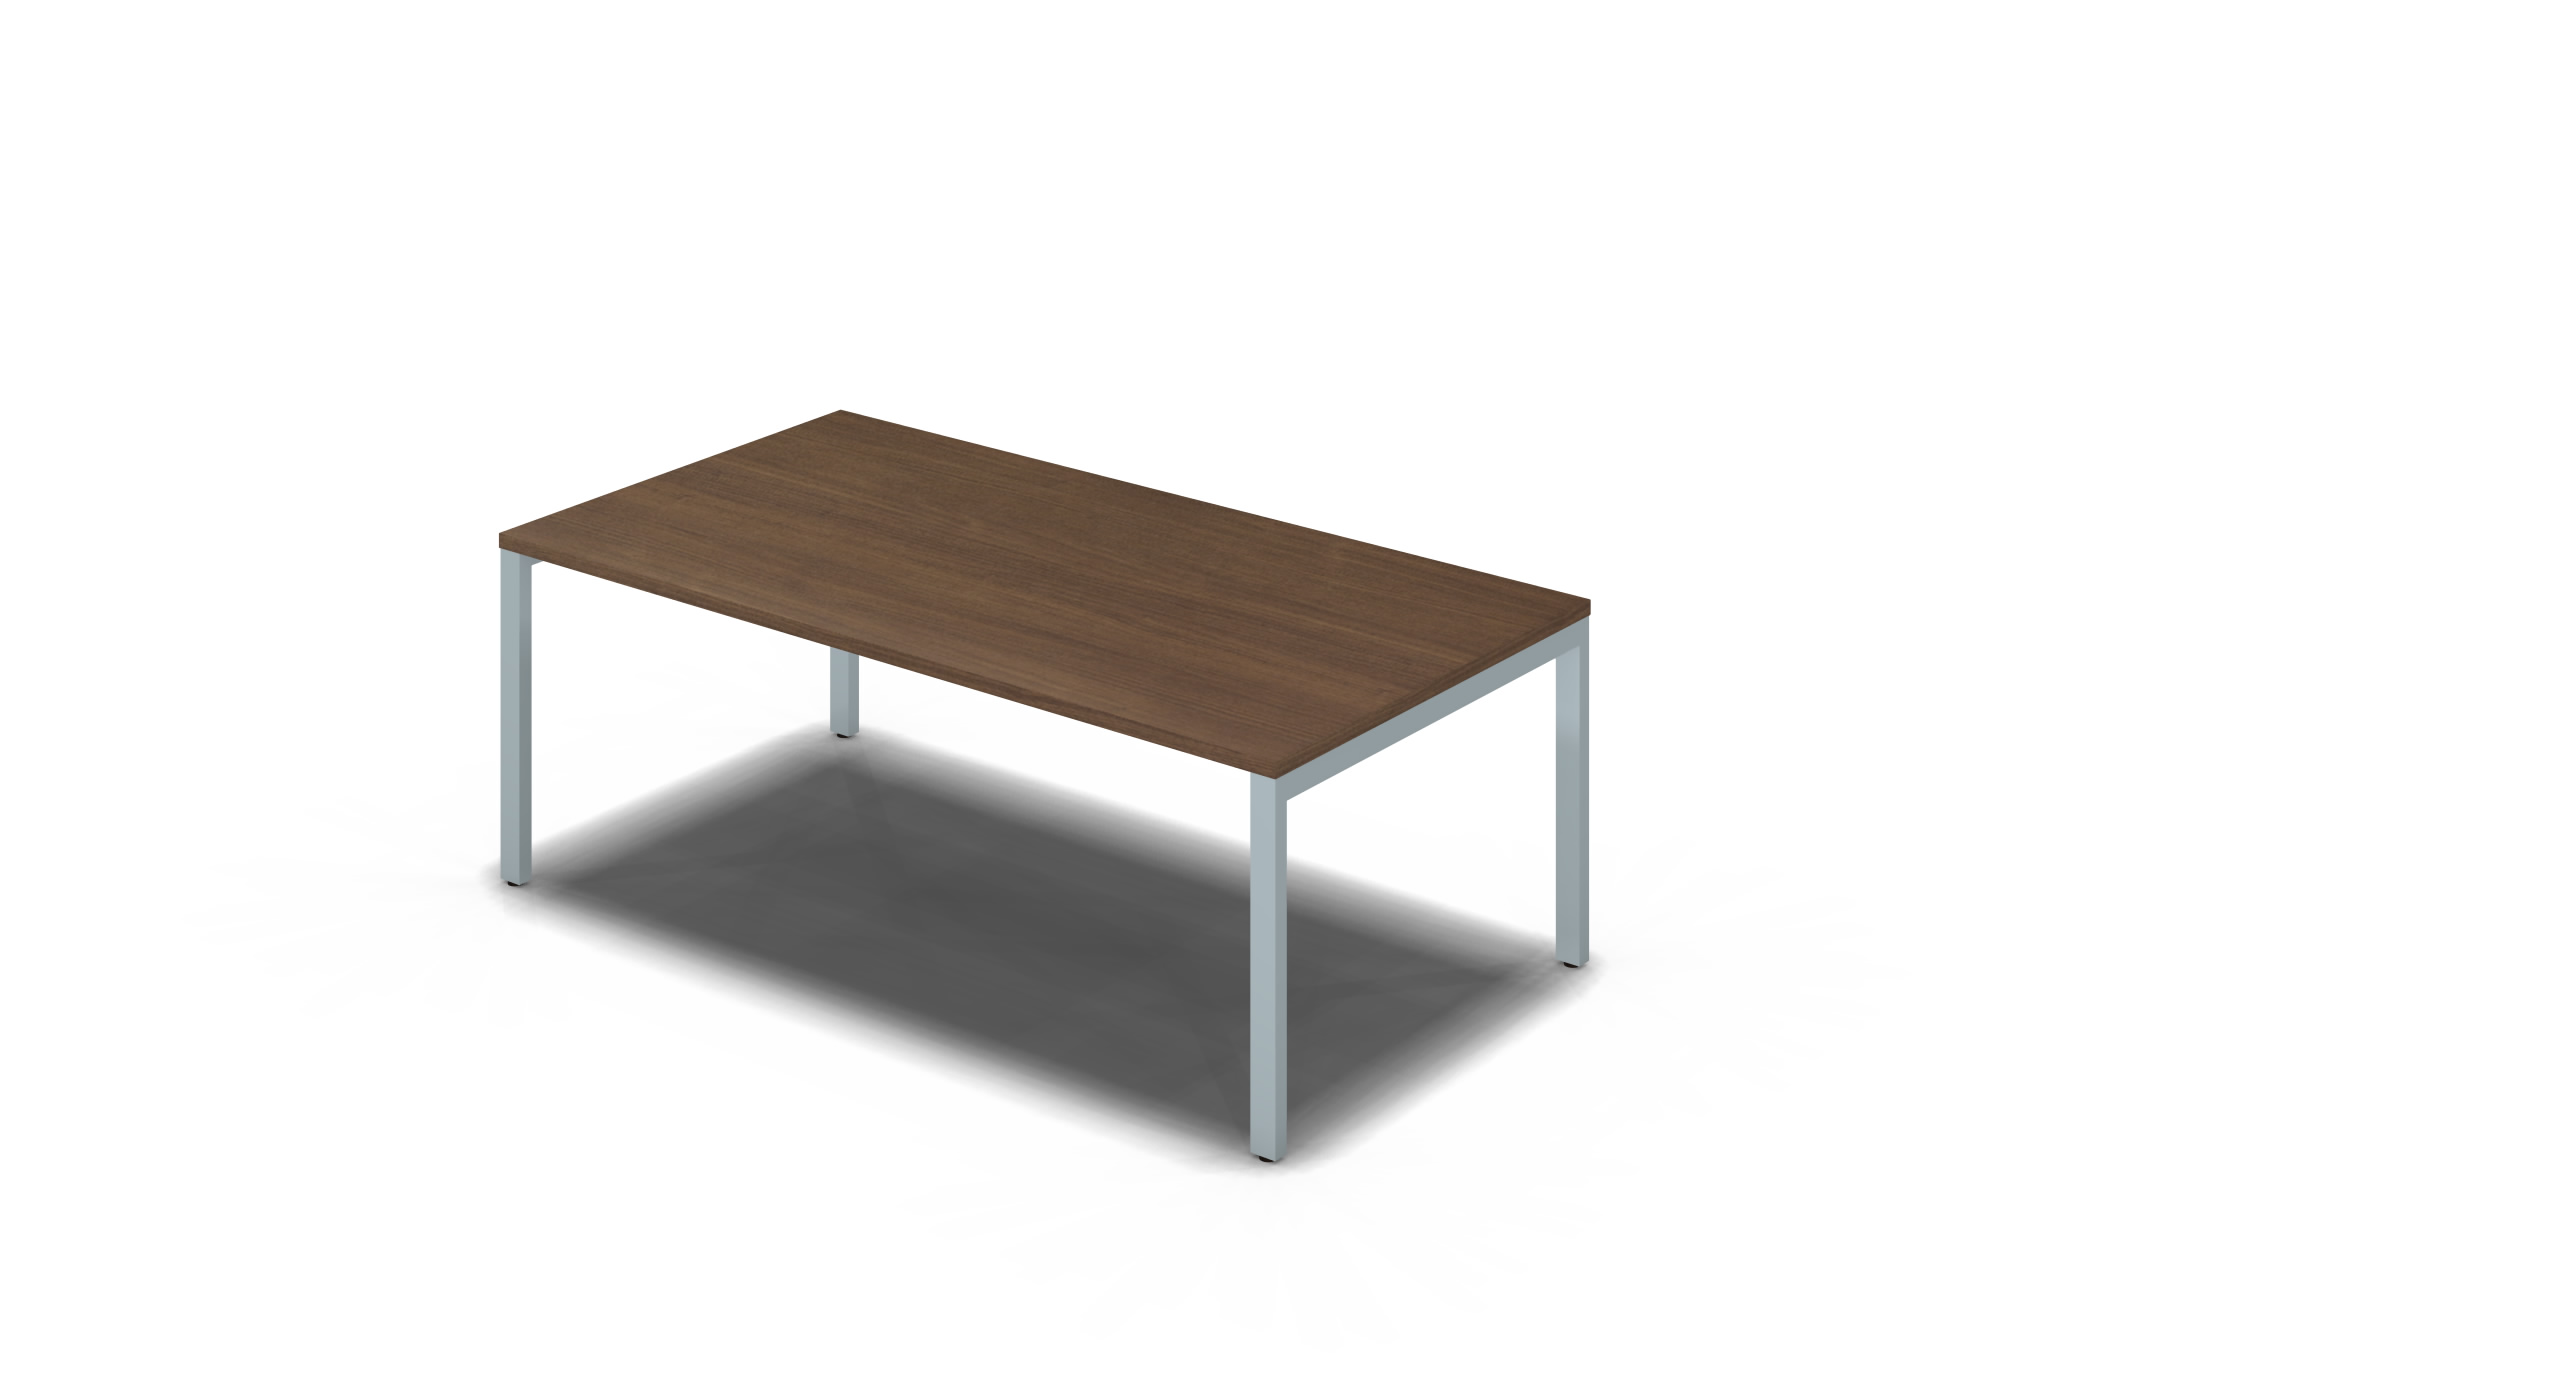 Table_Square_1800x900_Silver_Walnut_noOption